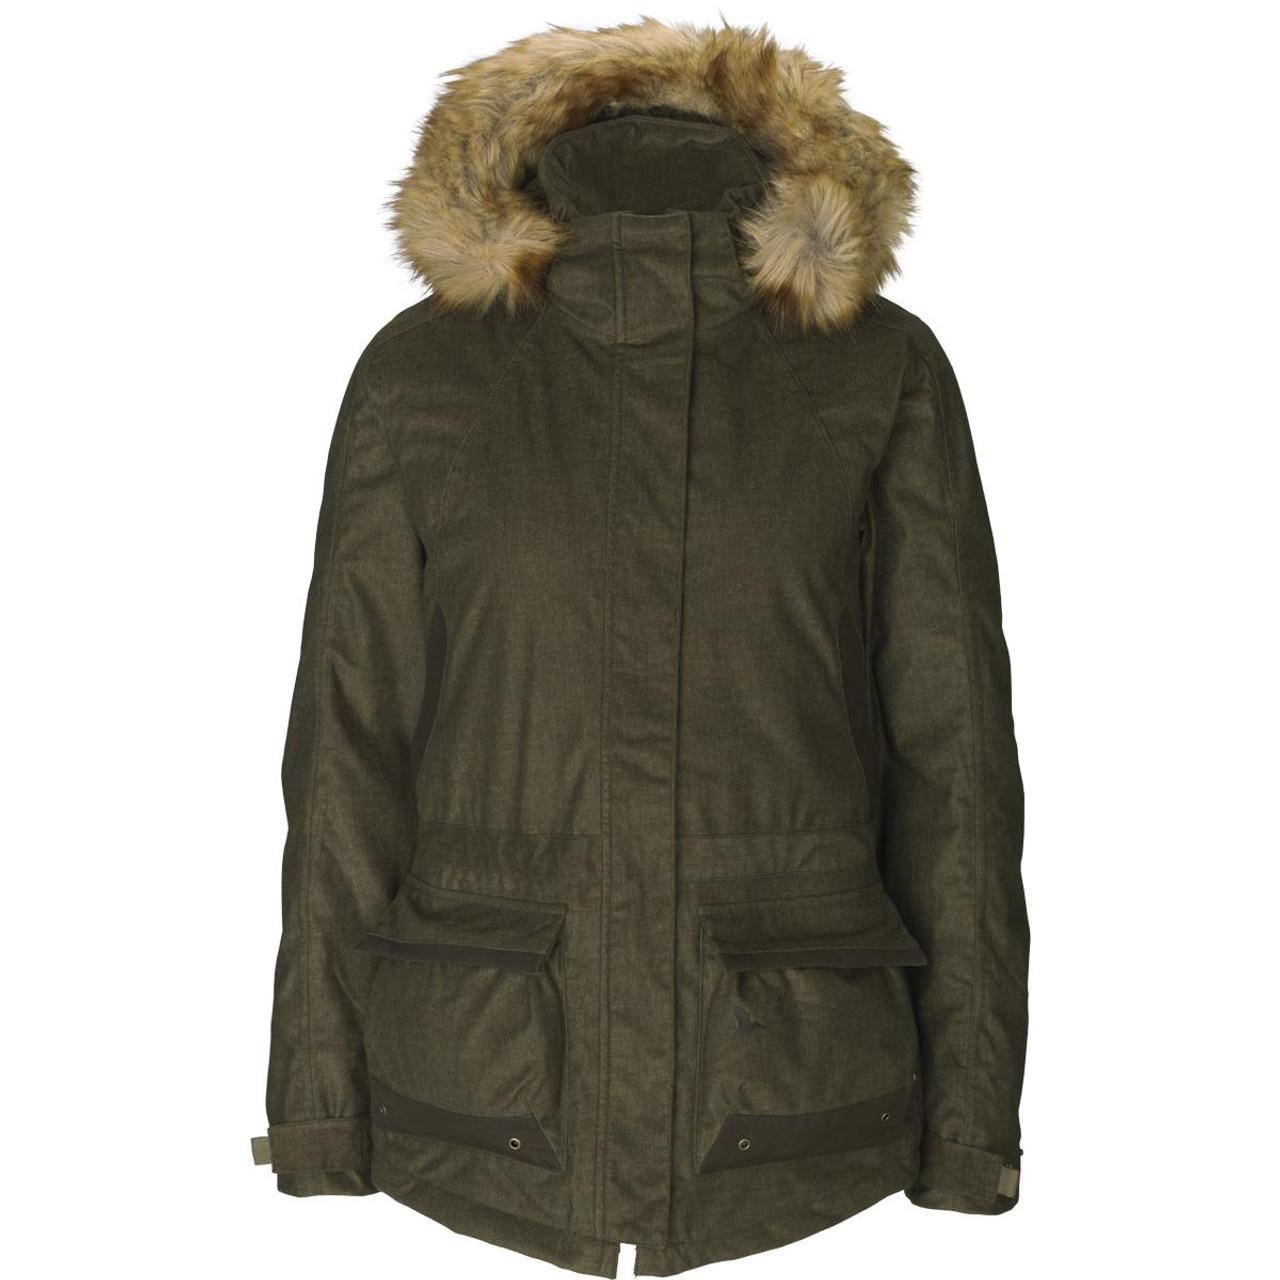 Pine Green Seeland North Lady Jacket